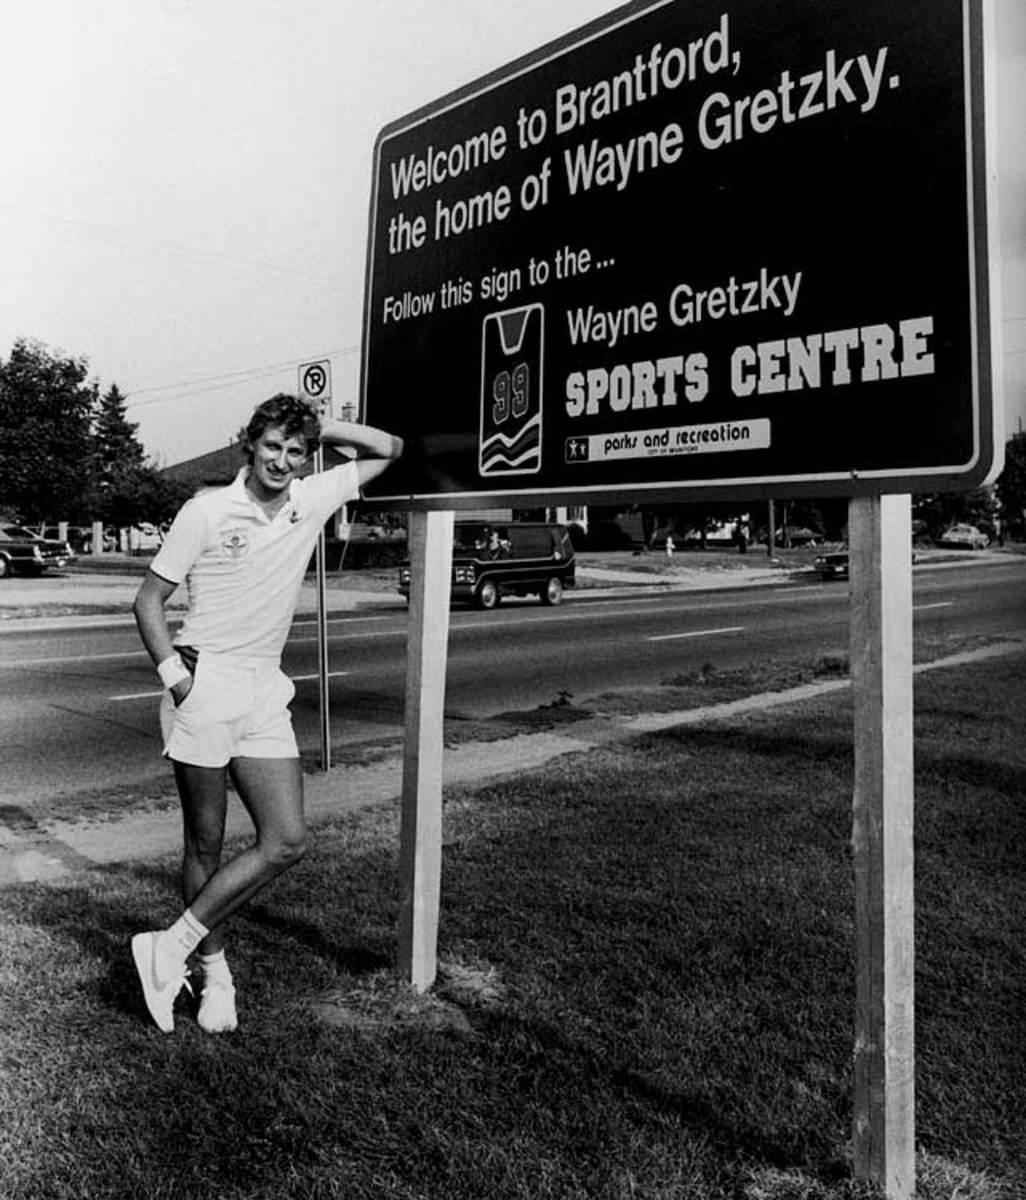 wayne-gretzky-brantford-sign.jpg